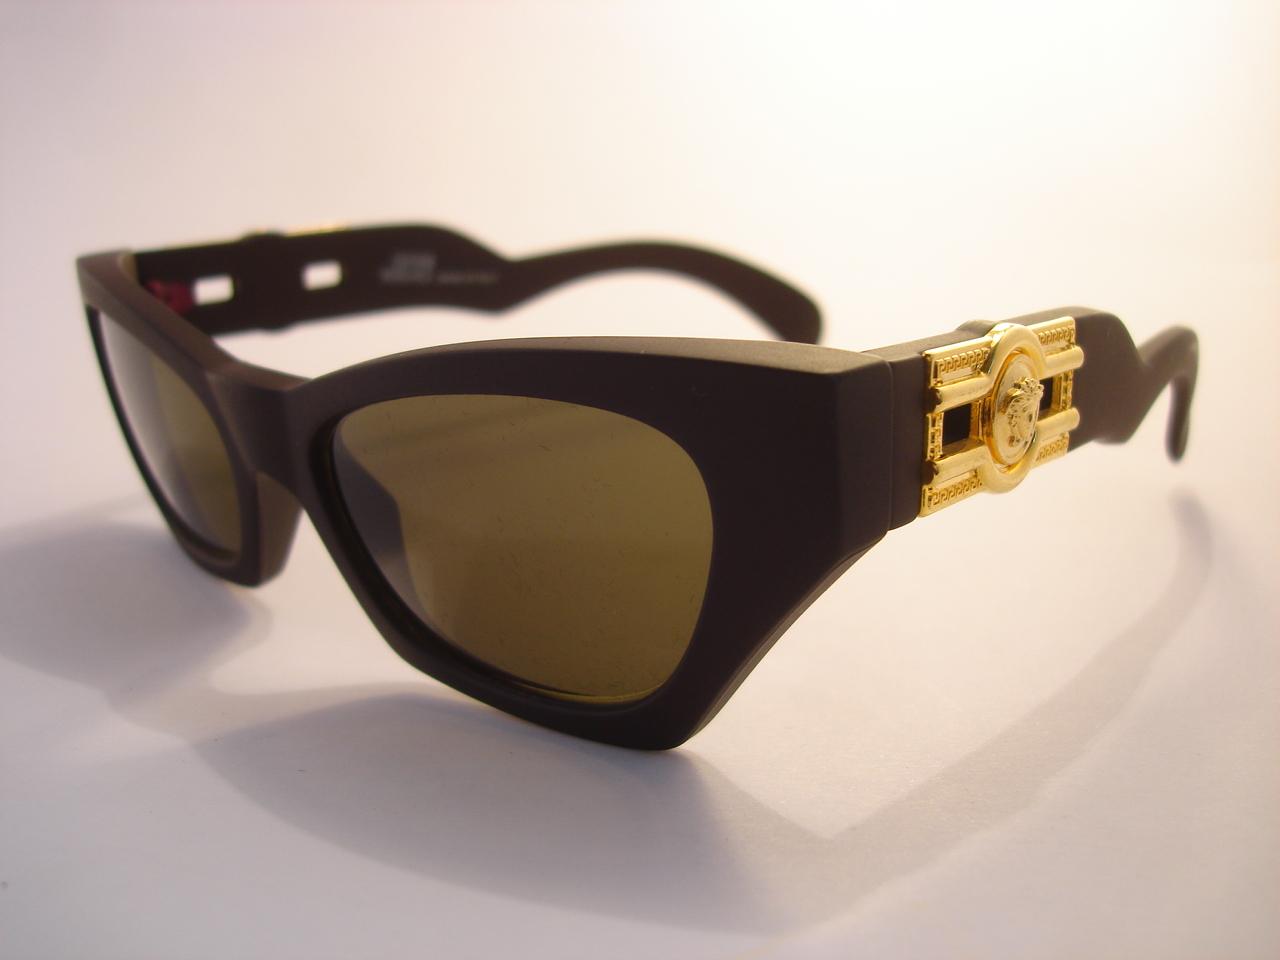 247da722cca9 vintage GIANNI VERSACE 477/B 915 matte medusa sunglasses MADE IN ITALY 90s  black gold greek key